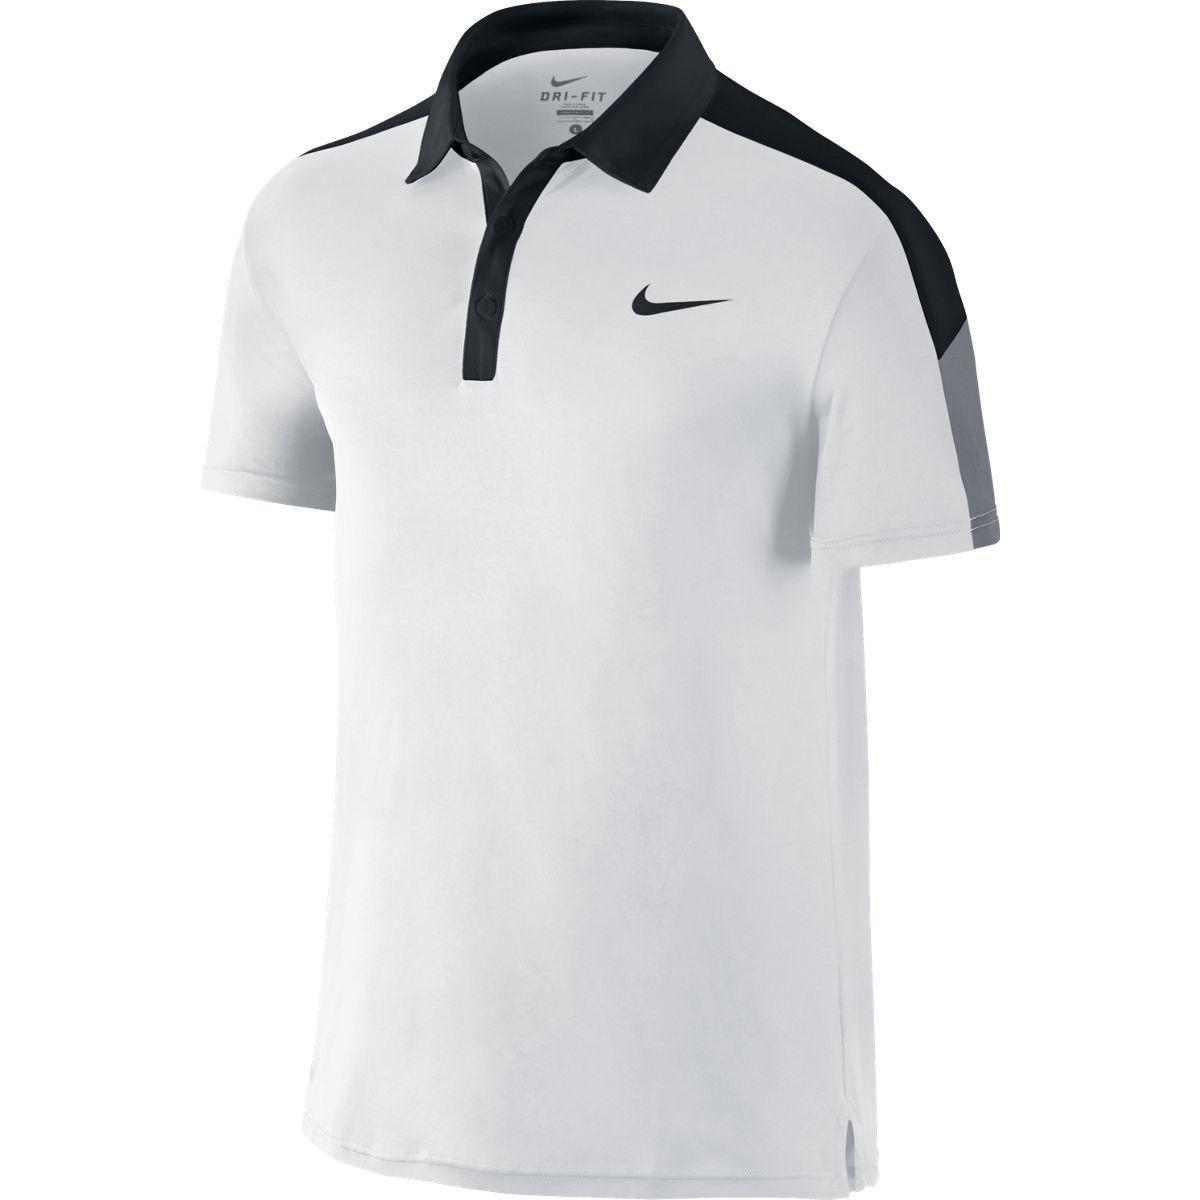 40c97d5e2 Nike Mens Team Court Polo - White/Black - Tennisnuts.com